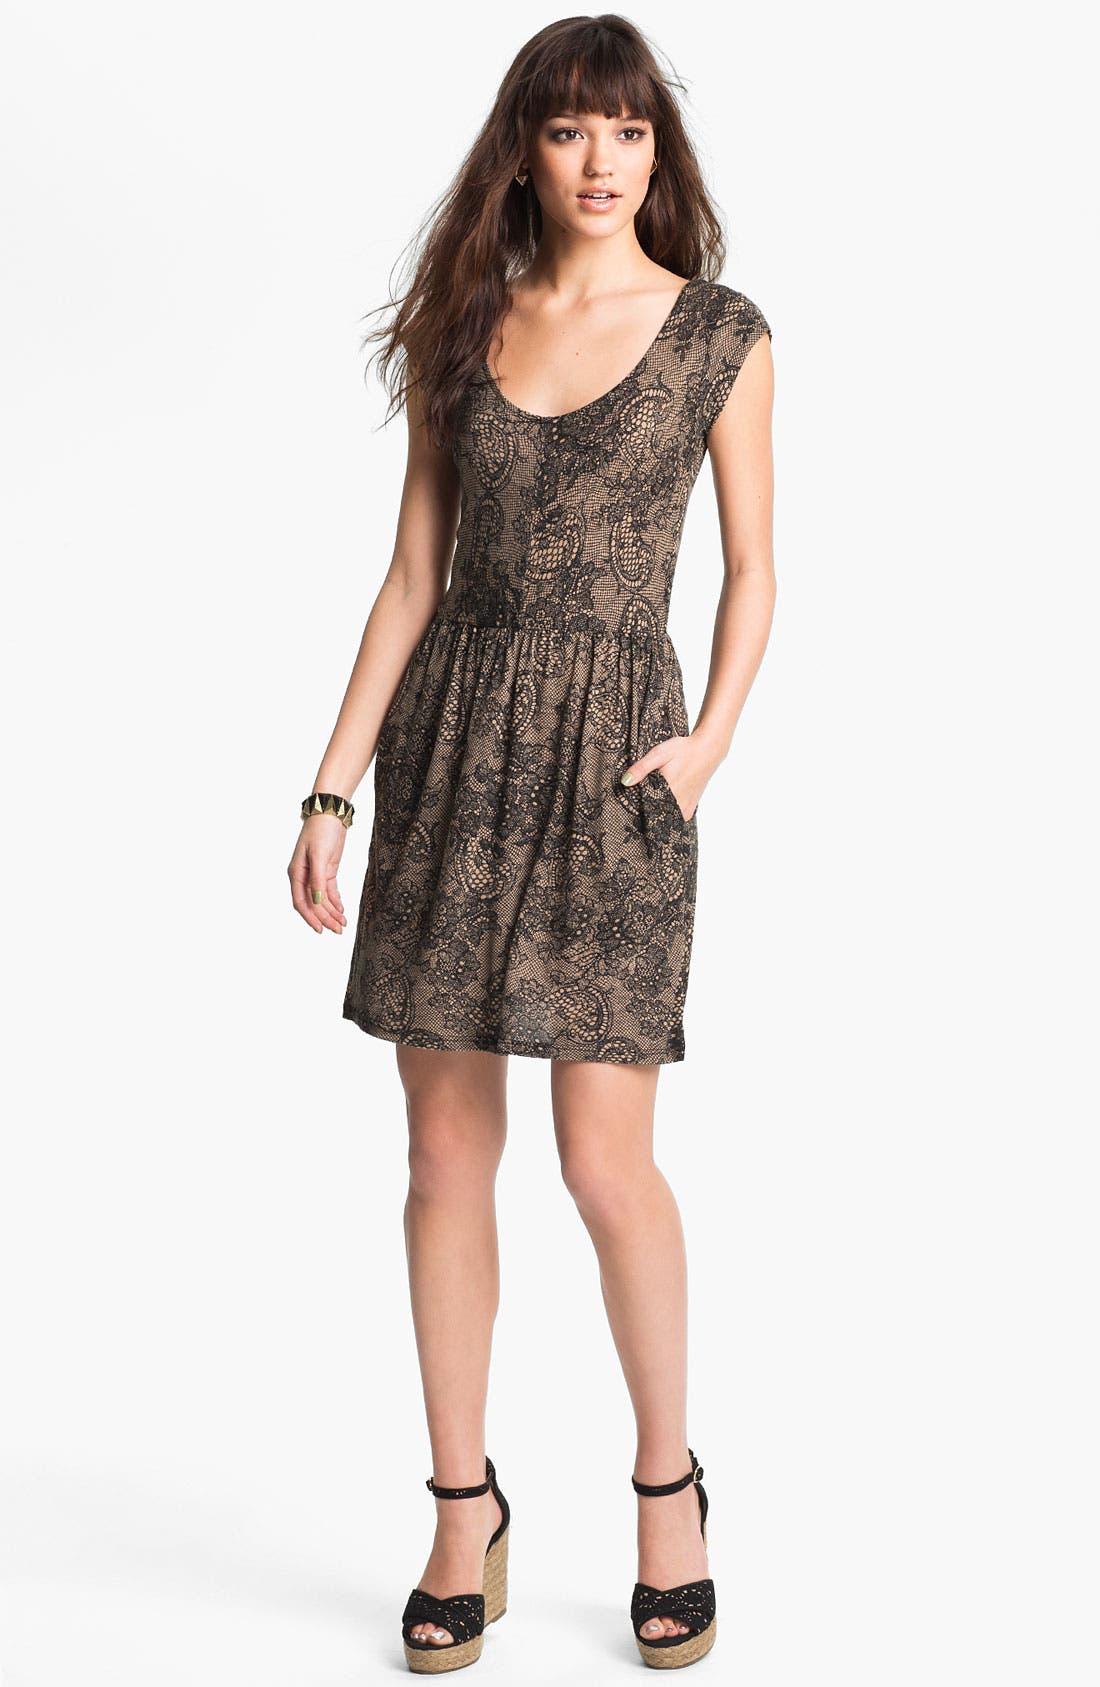 Alternate Image 1 Selected - Mimi Chica Paisley Print Dress (Juniors)